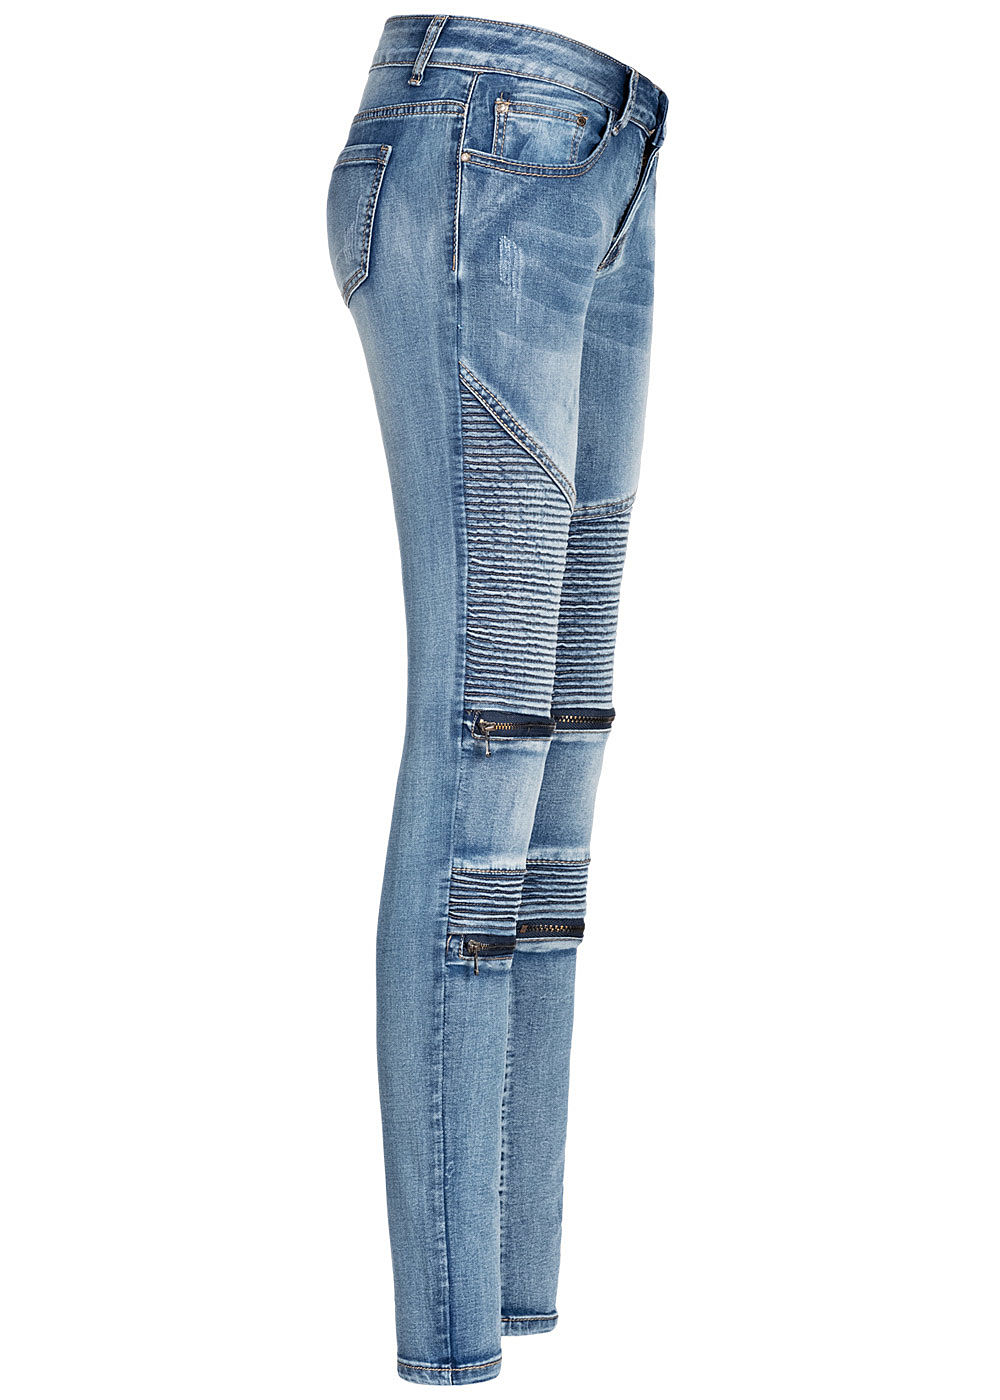 denim Seventyseven Pockets hell Damen Zip Lifestyle Biker 5 blau Jeans kOXiuPZ